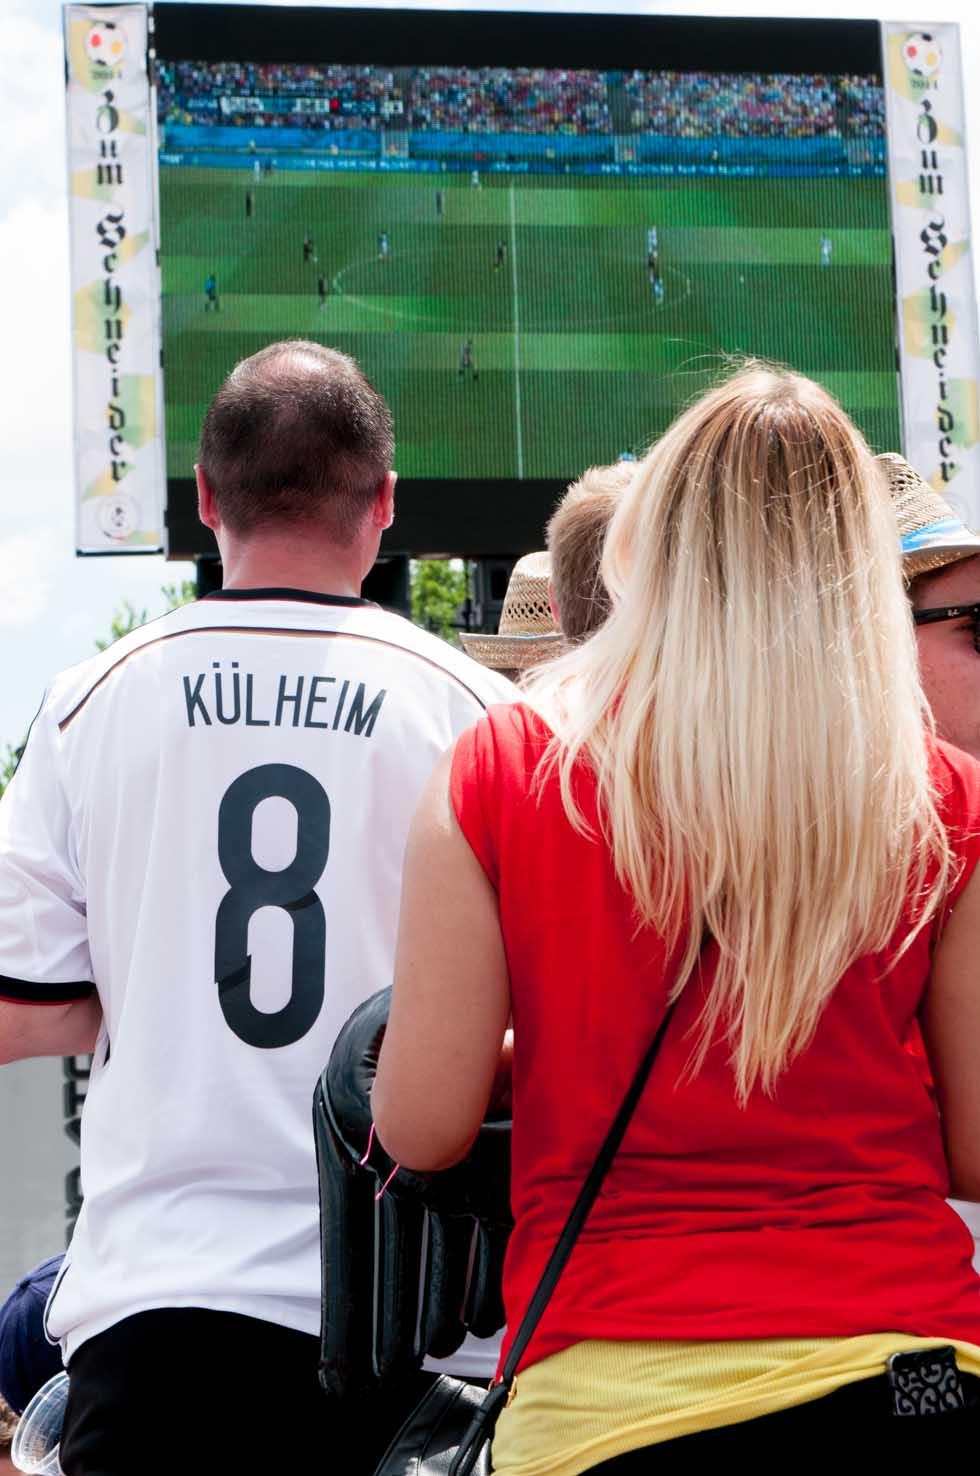 zum-schneider-nyc-2014-world-cup-germany-usa-0367.jpg